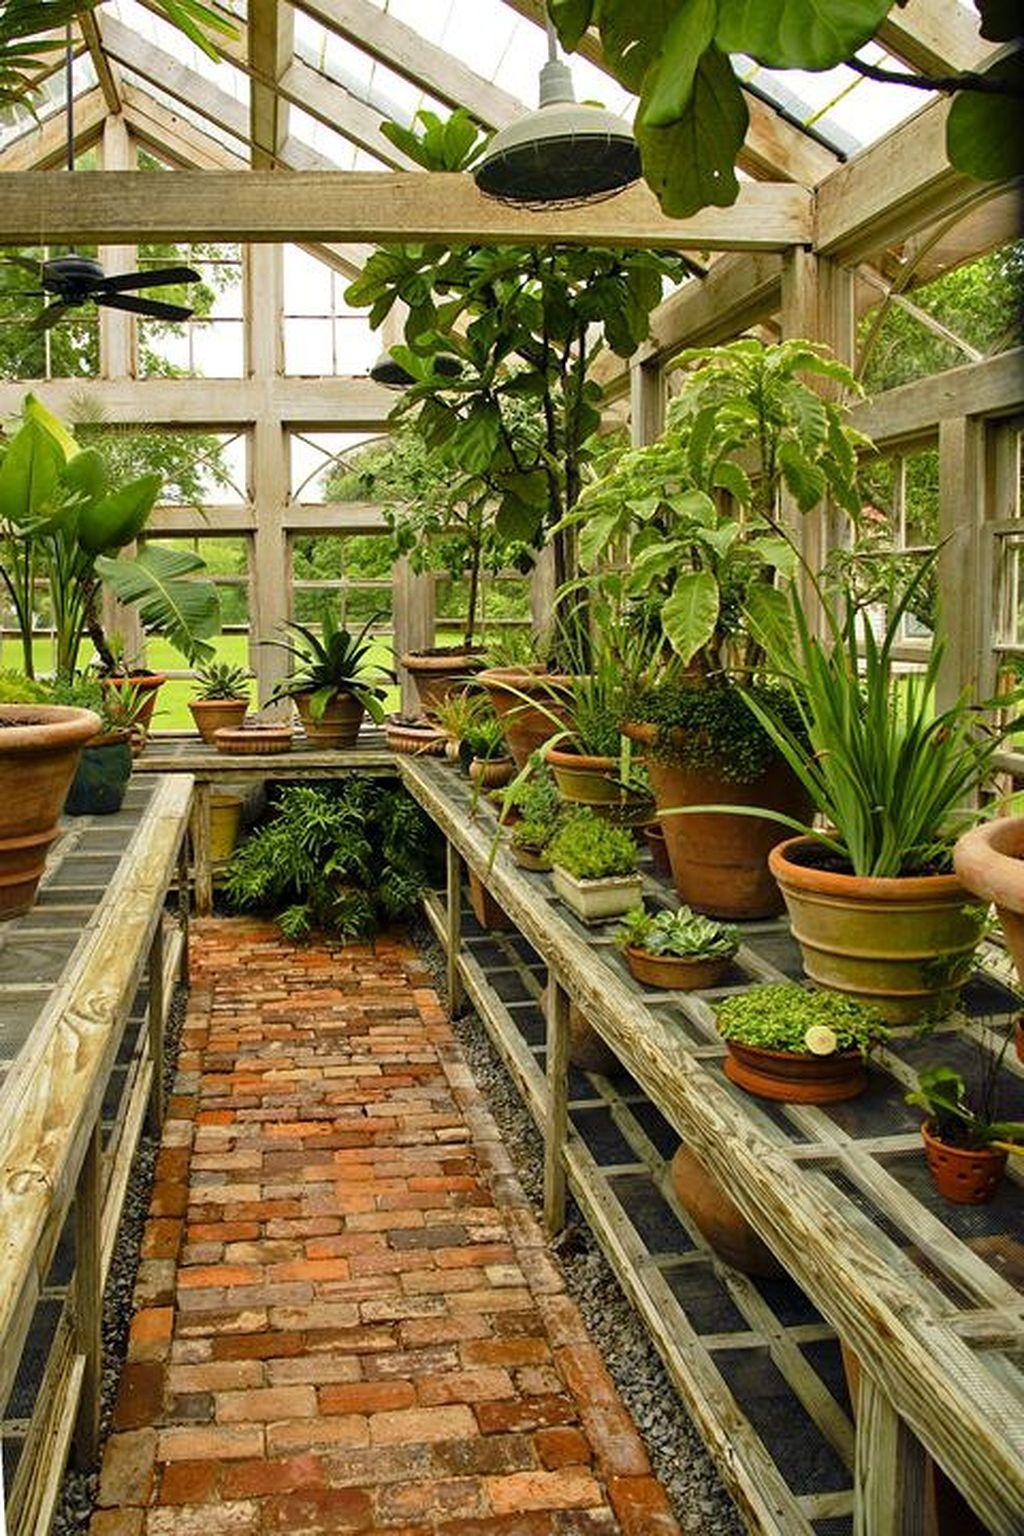 Greenhouse Gardening For Beginners Ideas 7 Greenhouse Gardening Backyard Backyard Greenhouse Backyard greenhouse for beginners